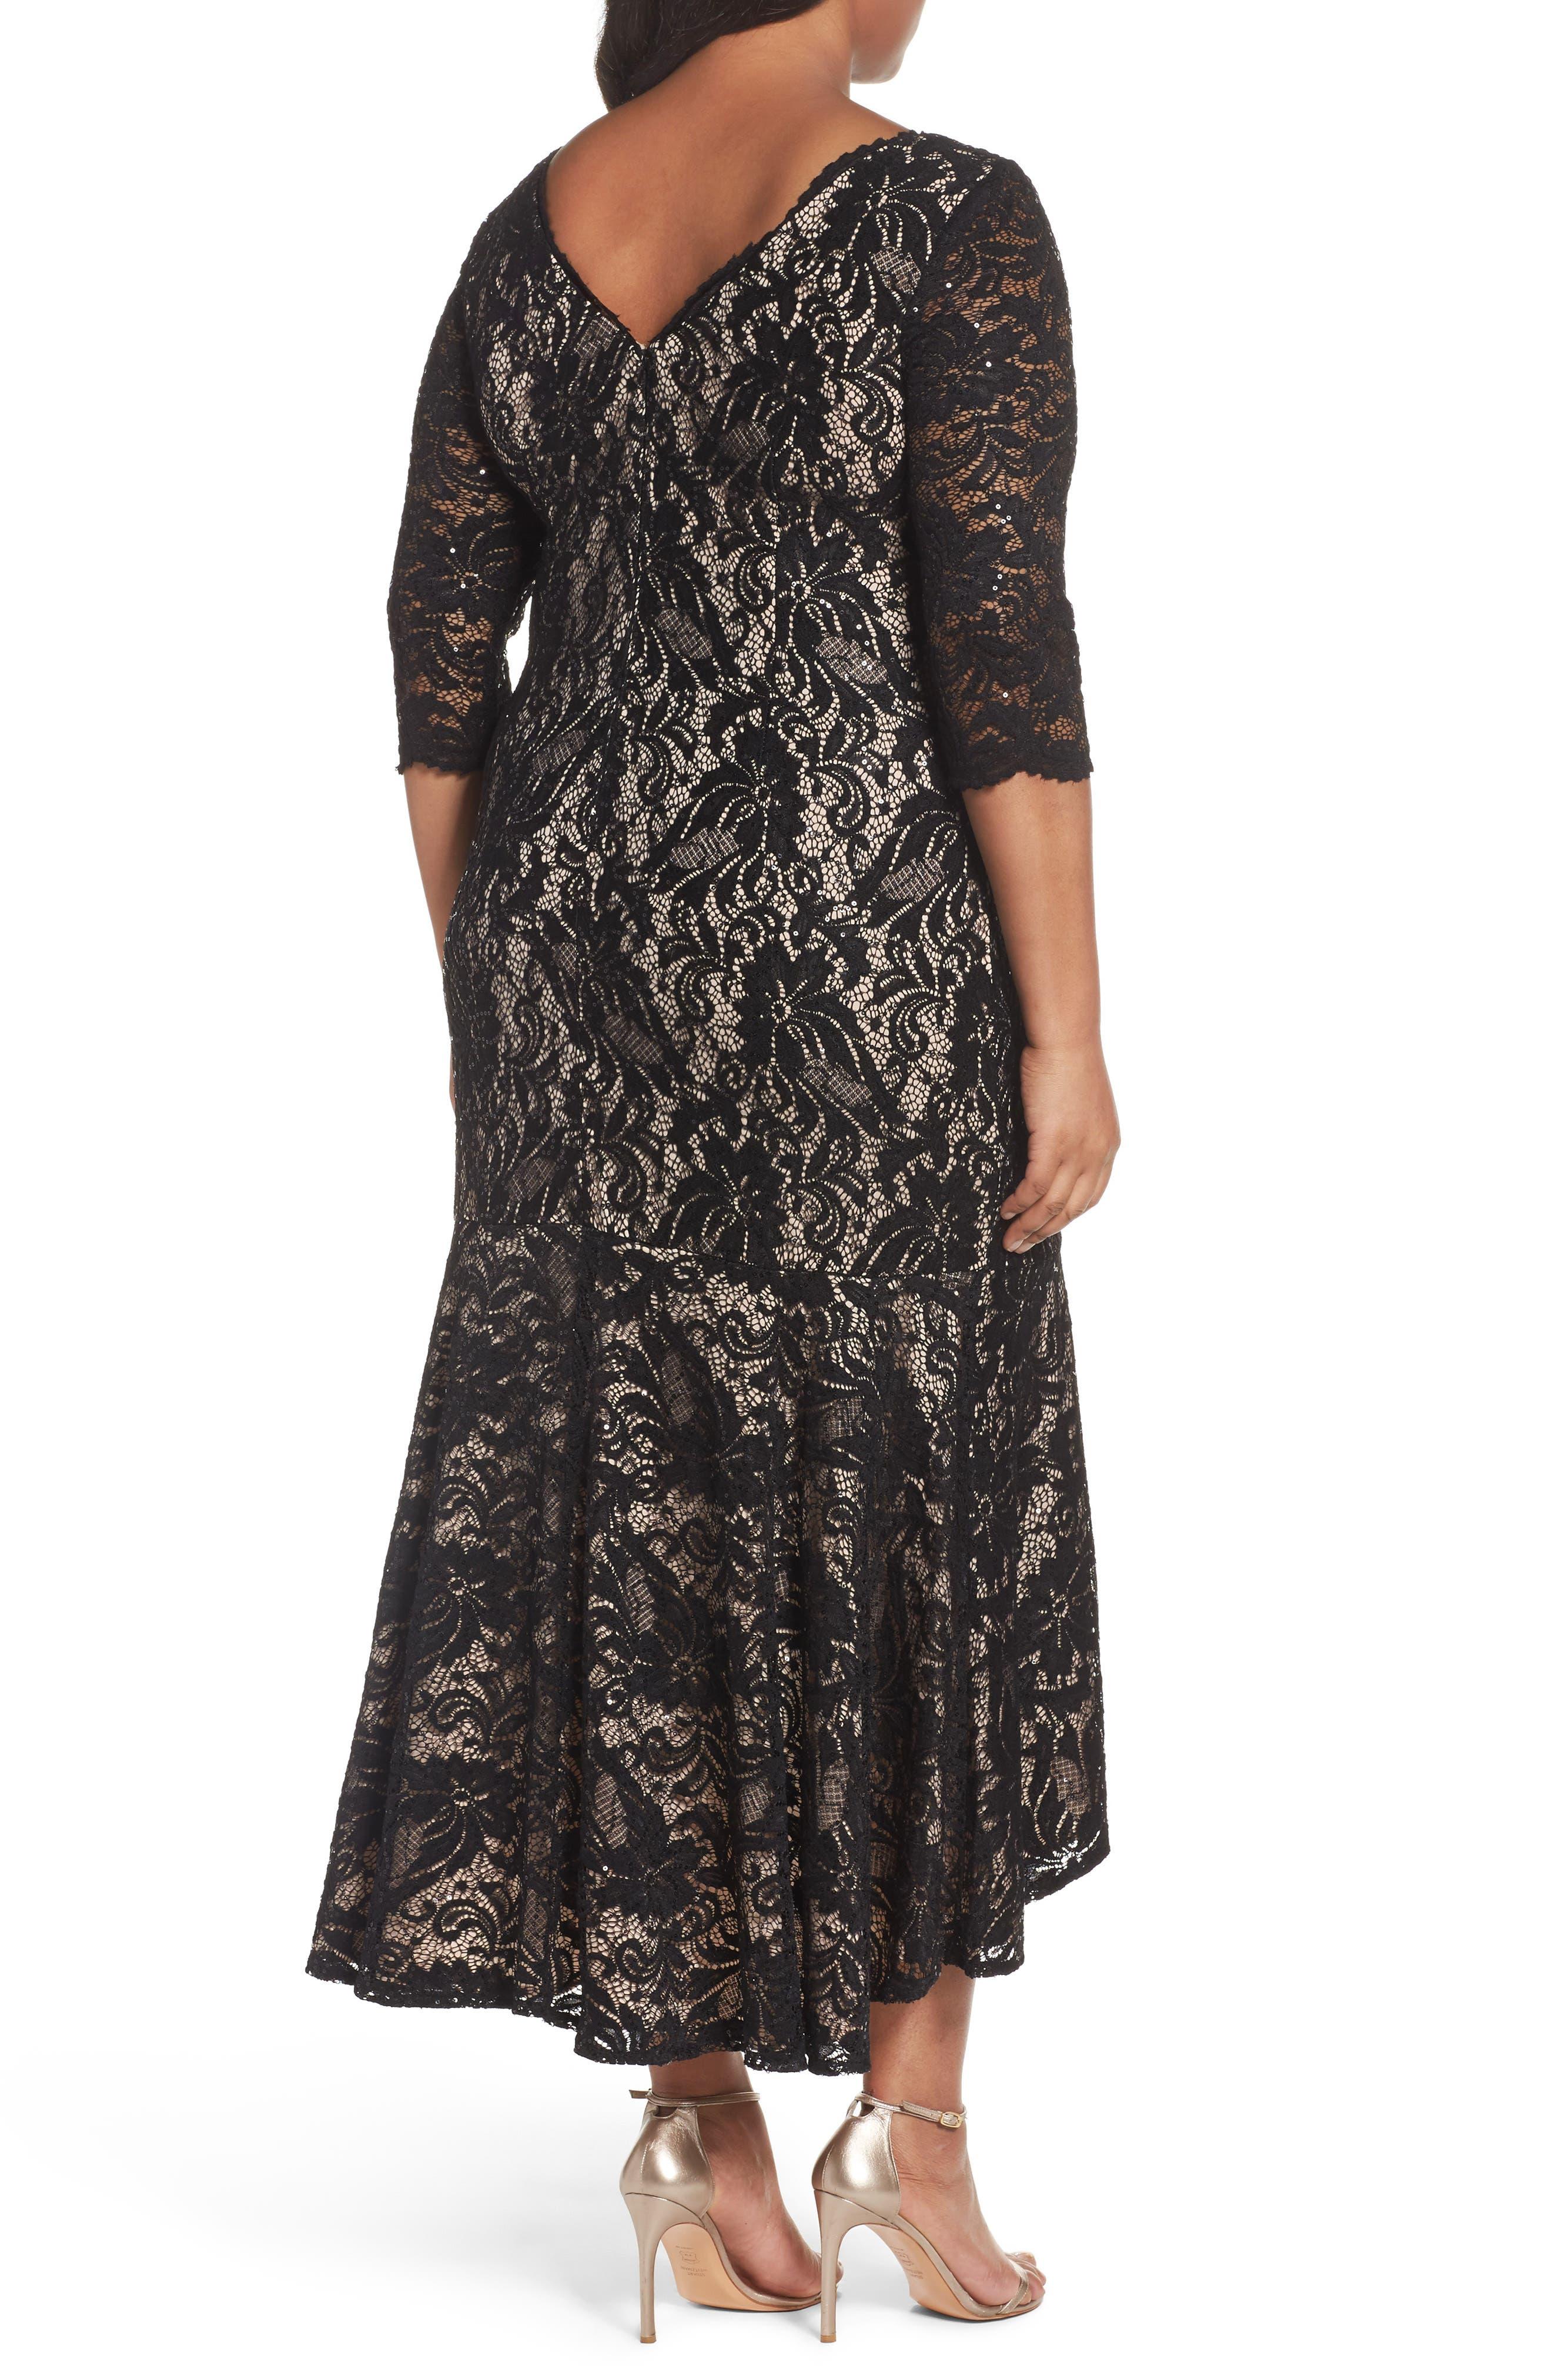 Alternate Image 2  - Alex Evenings High/Low Lace Mermaid Dress (Plus Size)